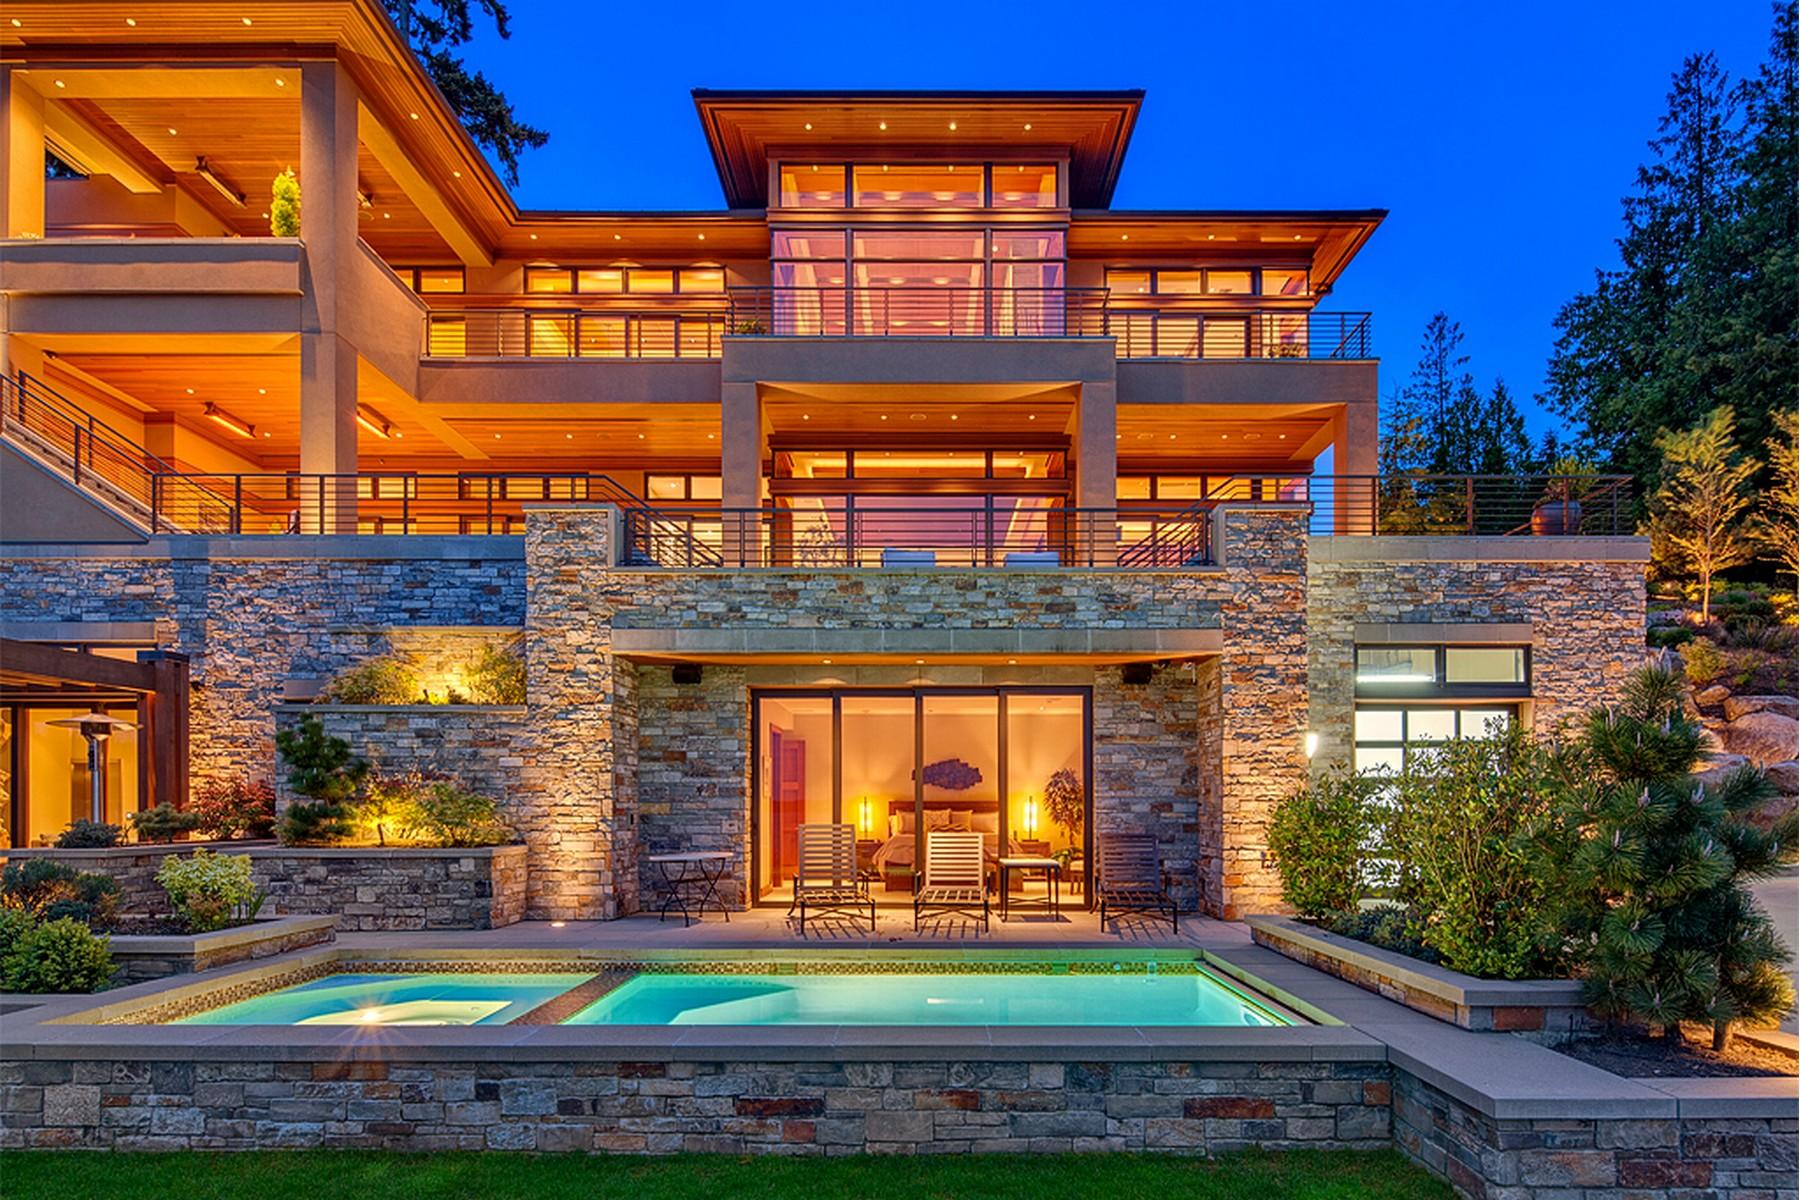 Single Family Home for Sale at Lake Sammamish Estate 18110 SE 41st Lane Bellevue, Washington 98008 United States